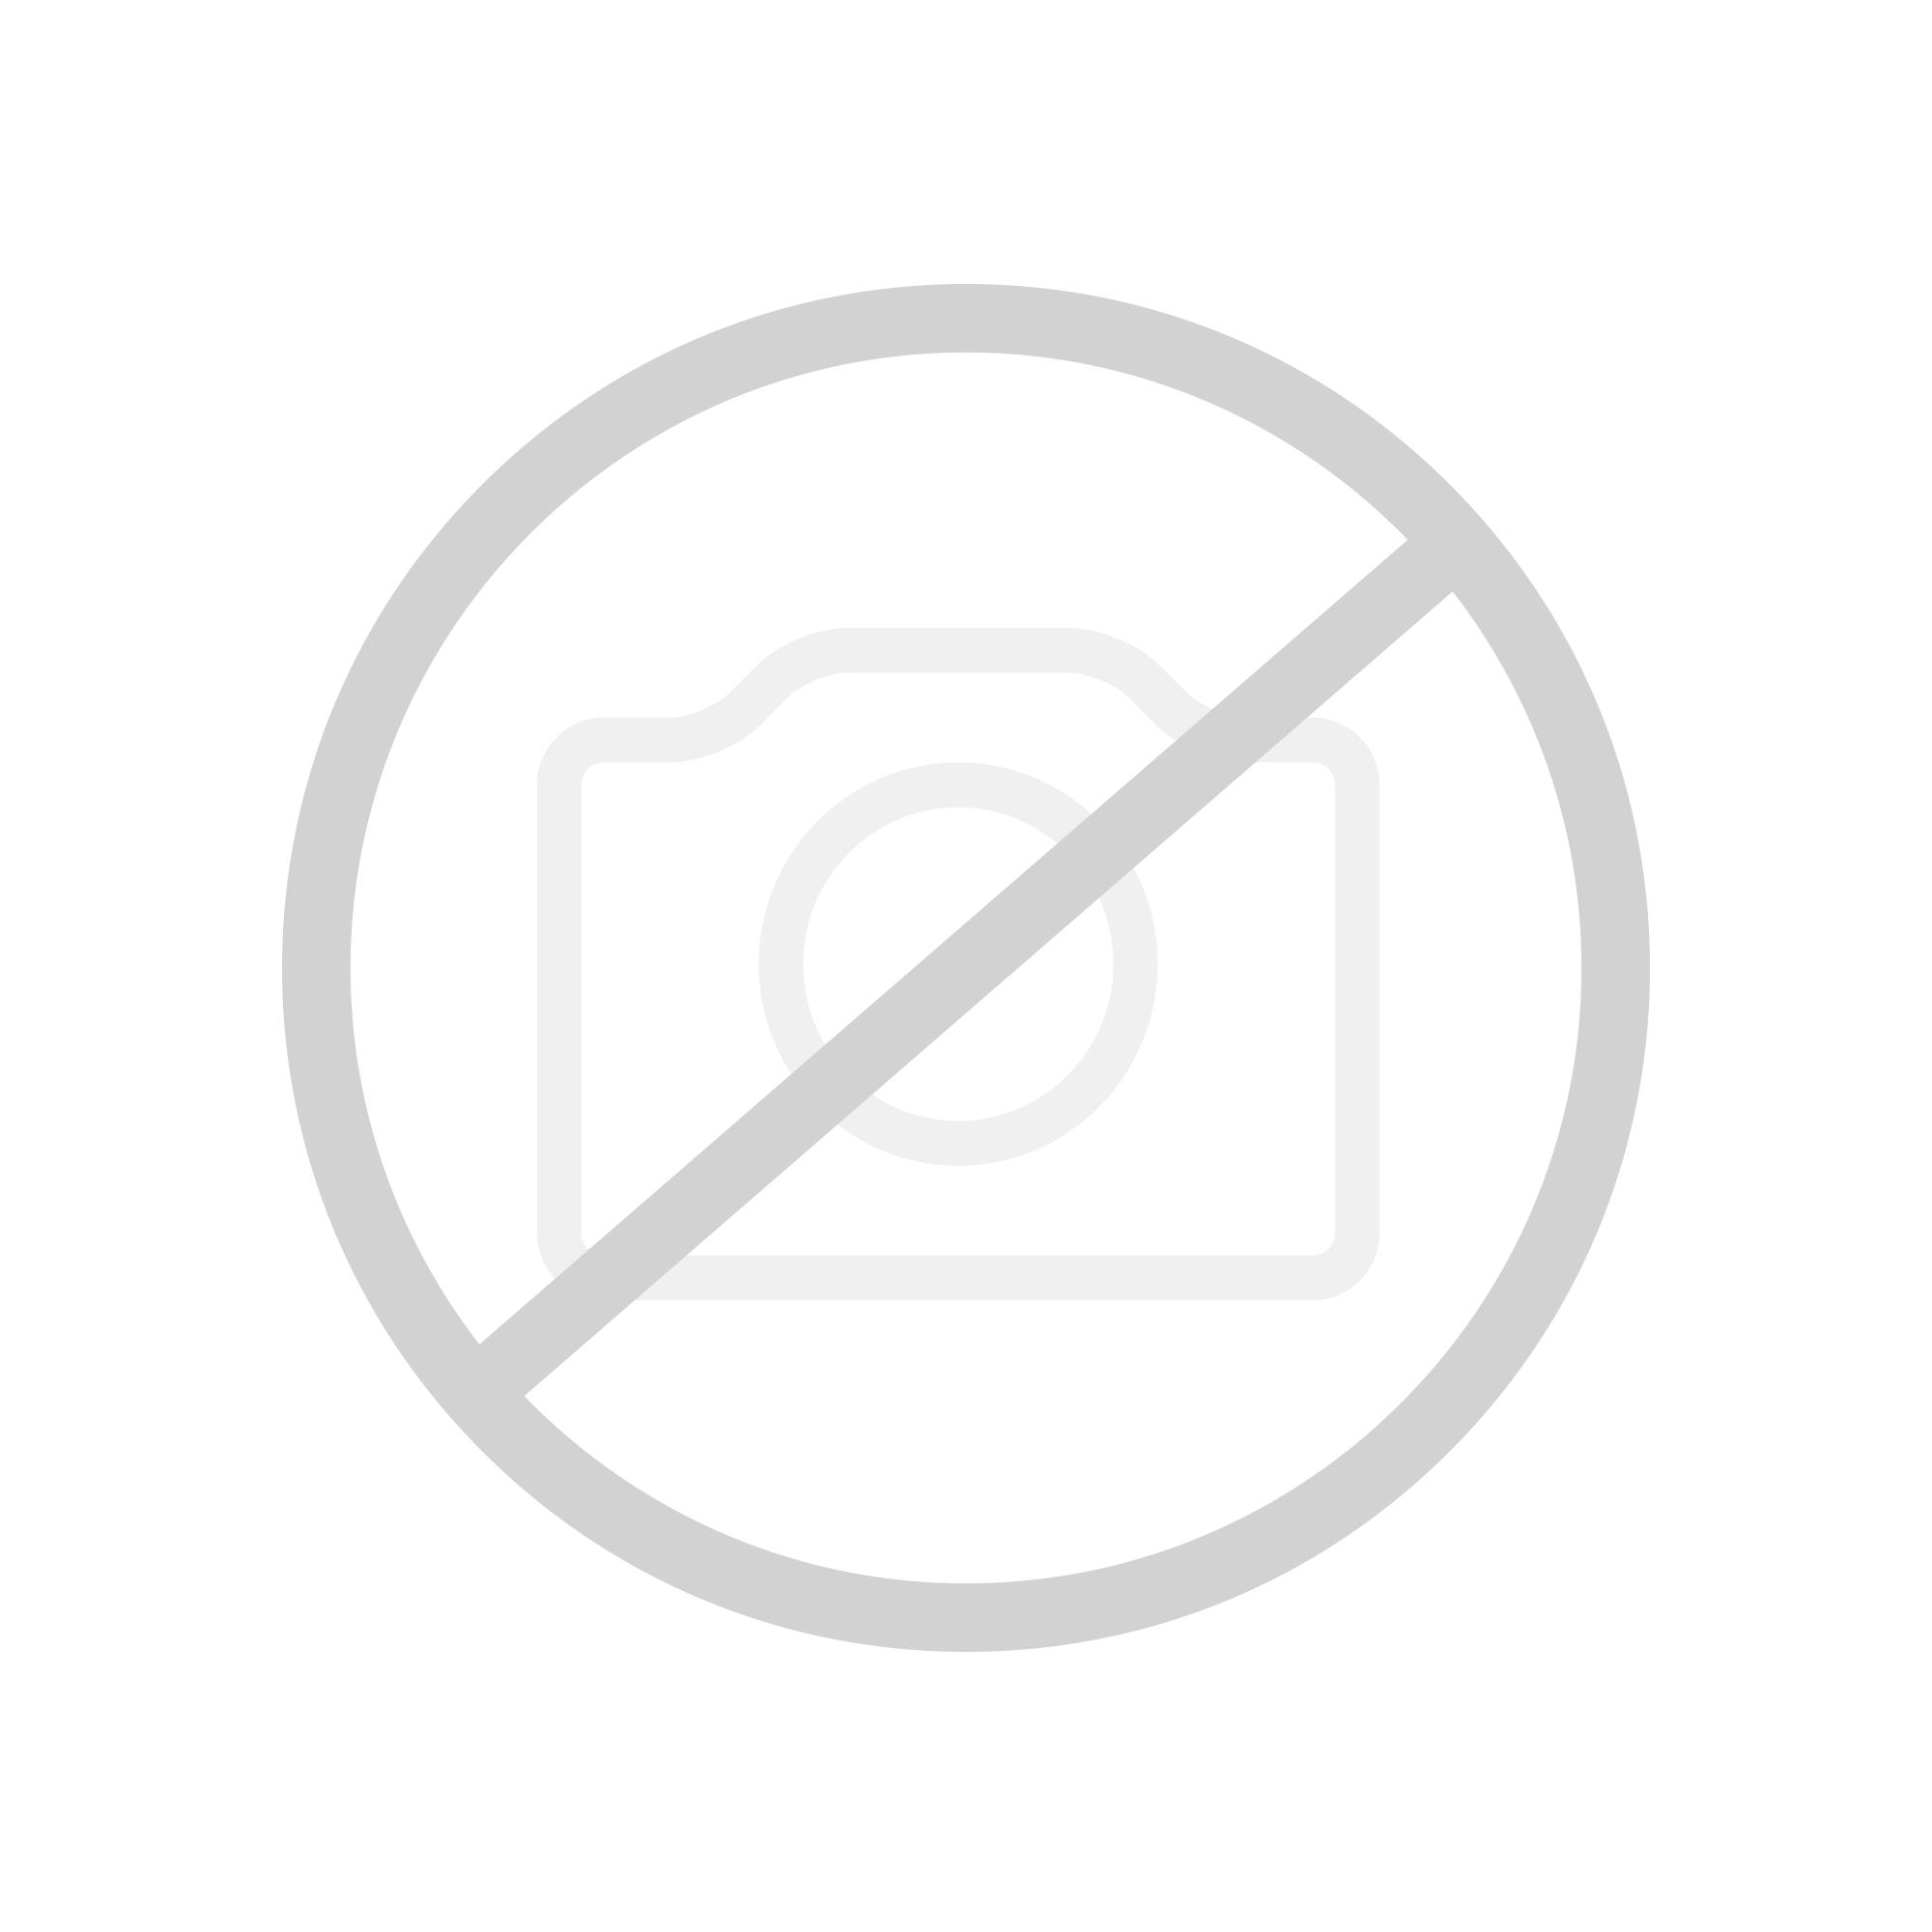 bette floor side rechteck duschwanne anthrazit 403 3386 403 reuter onlineshop. Black Bedroom Furniture Sets. Home Design Ideas